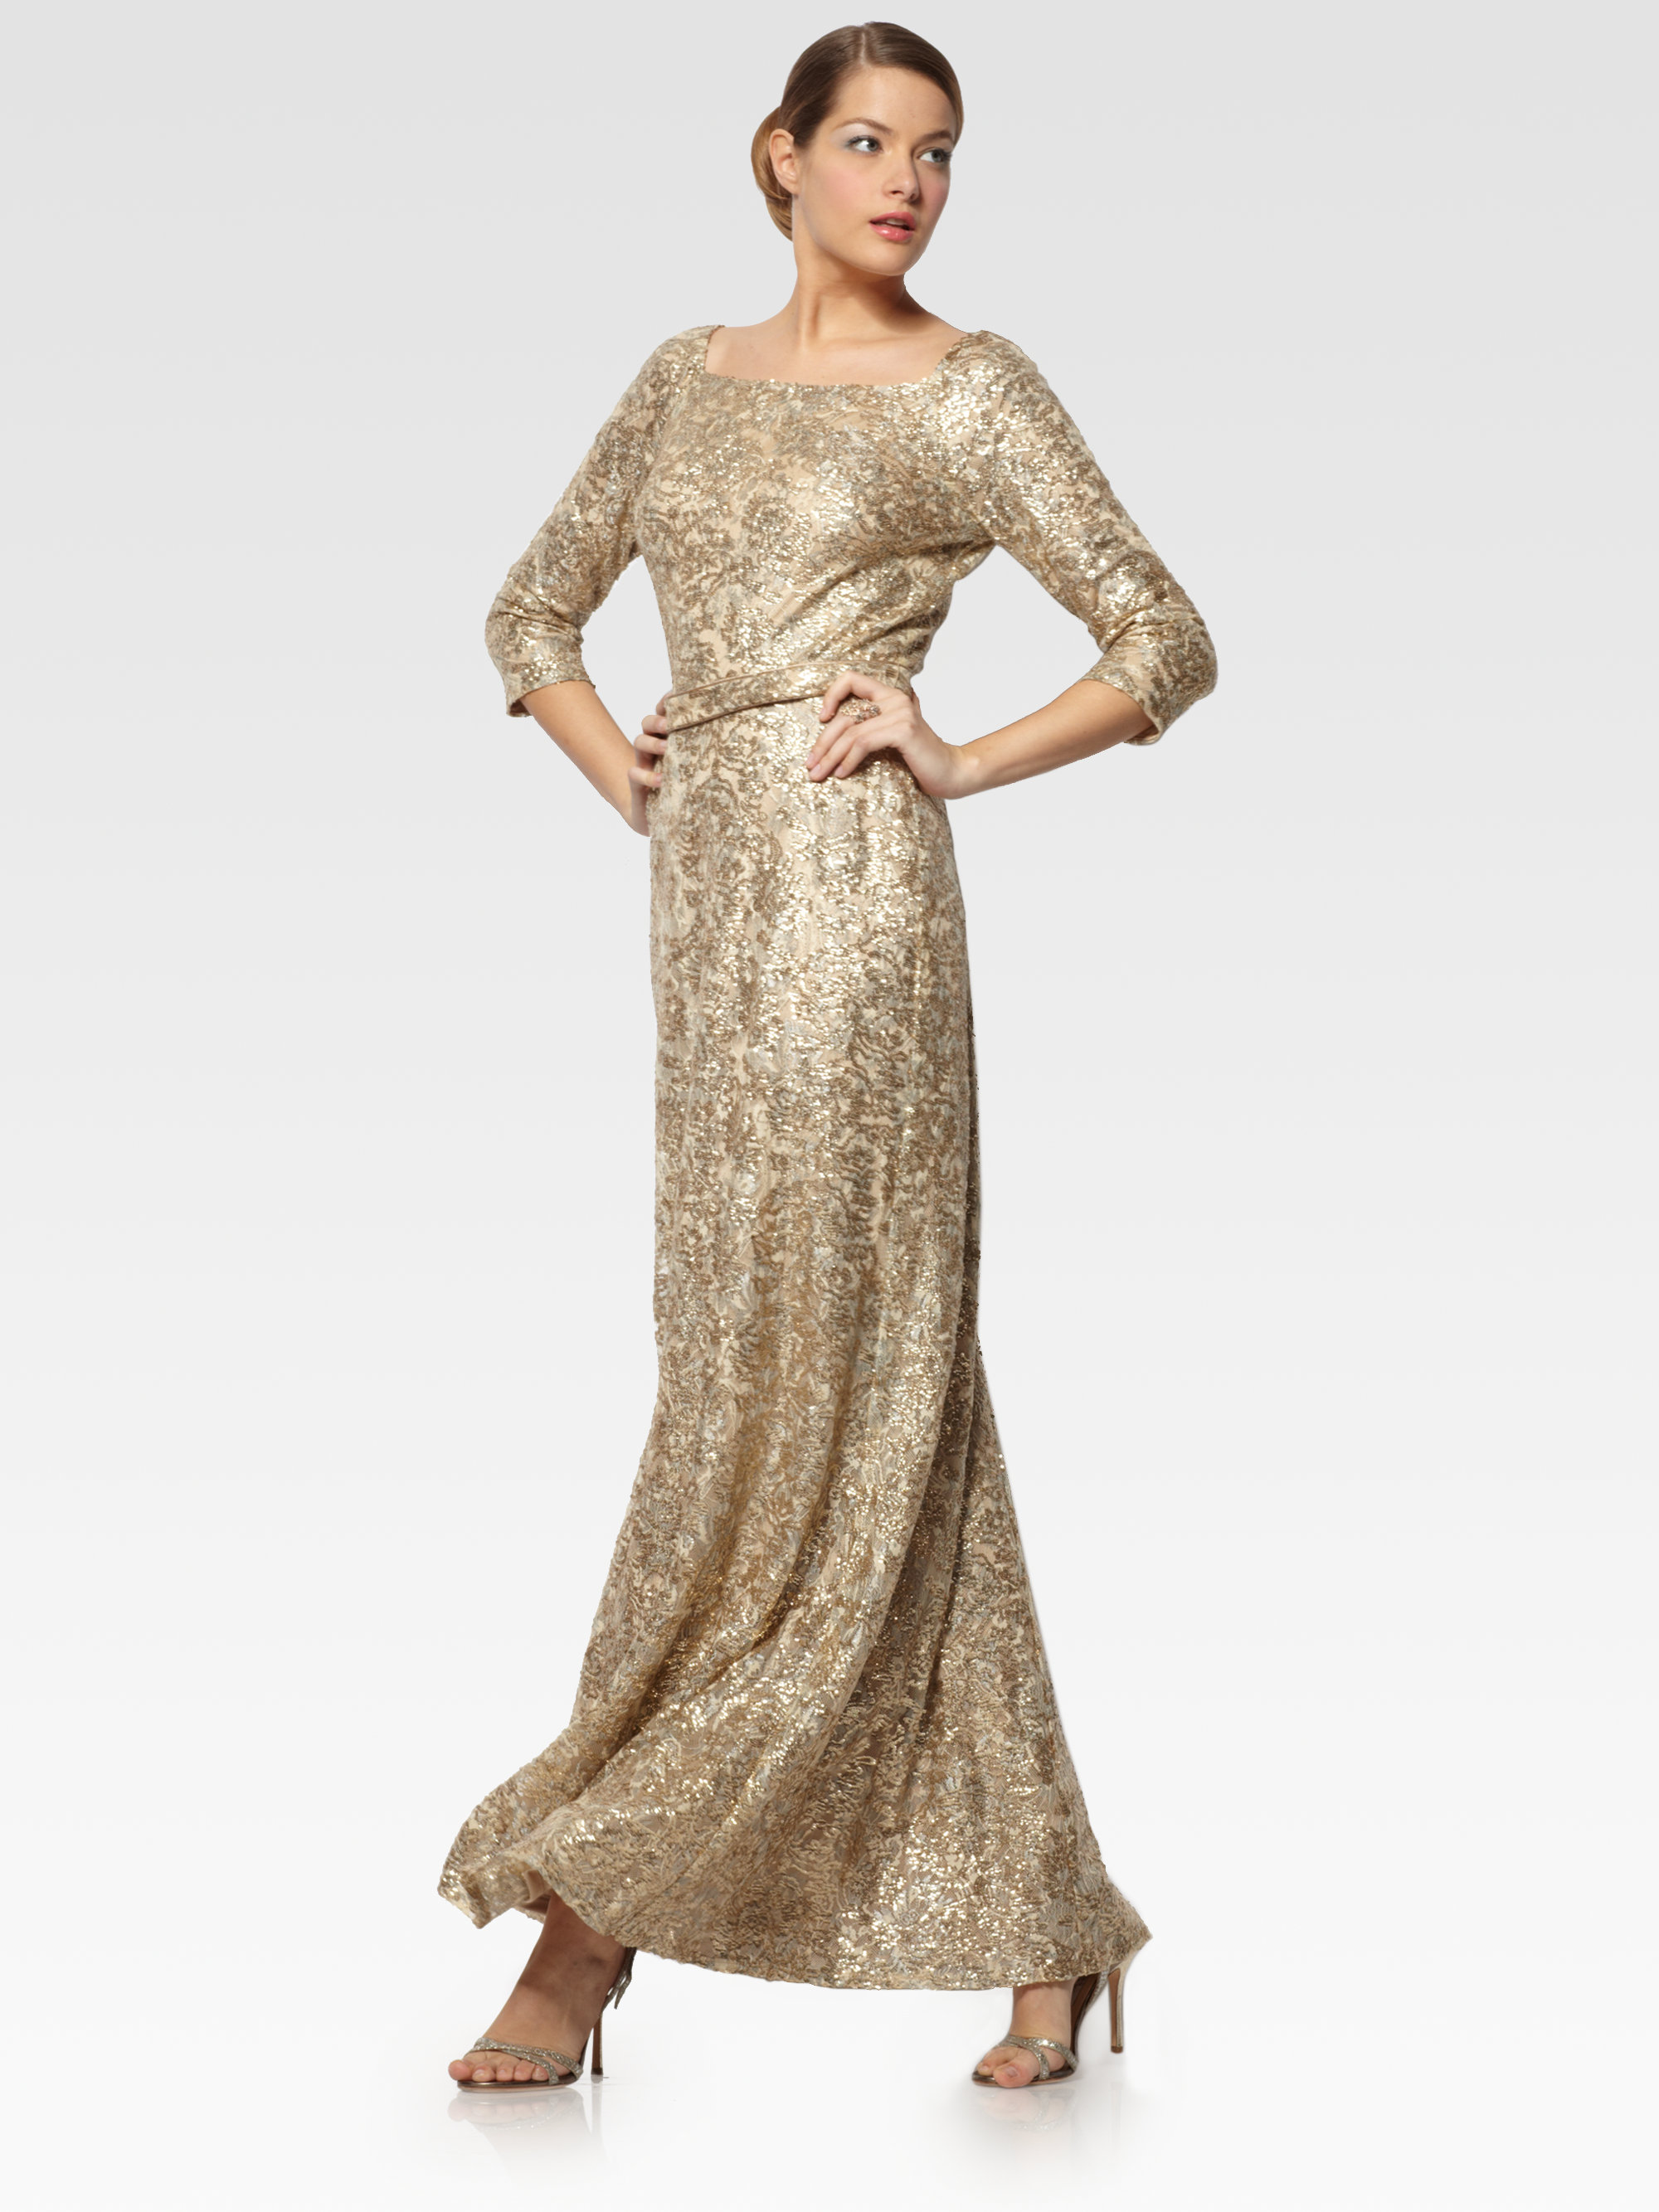 Lyst - David Meister Metallic Lace Gown in Metallic